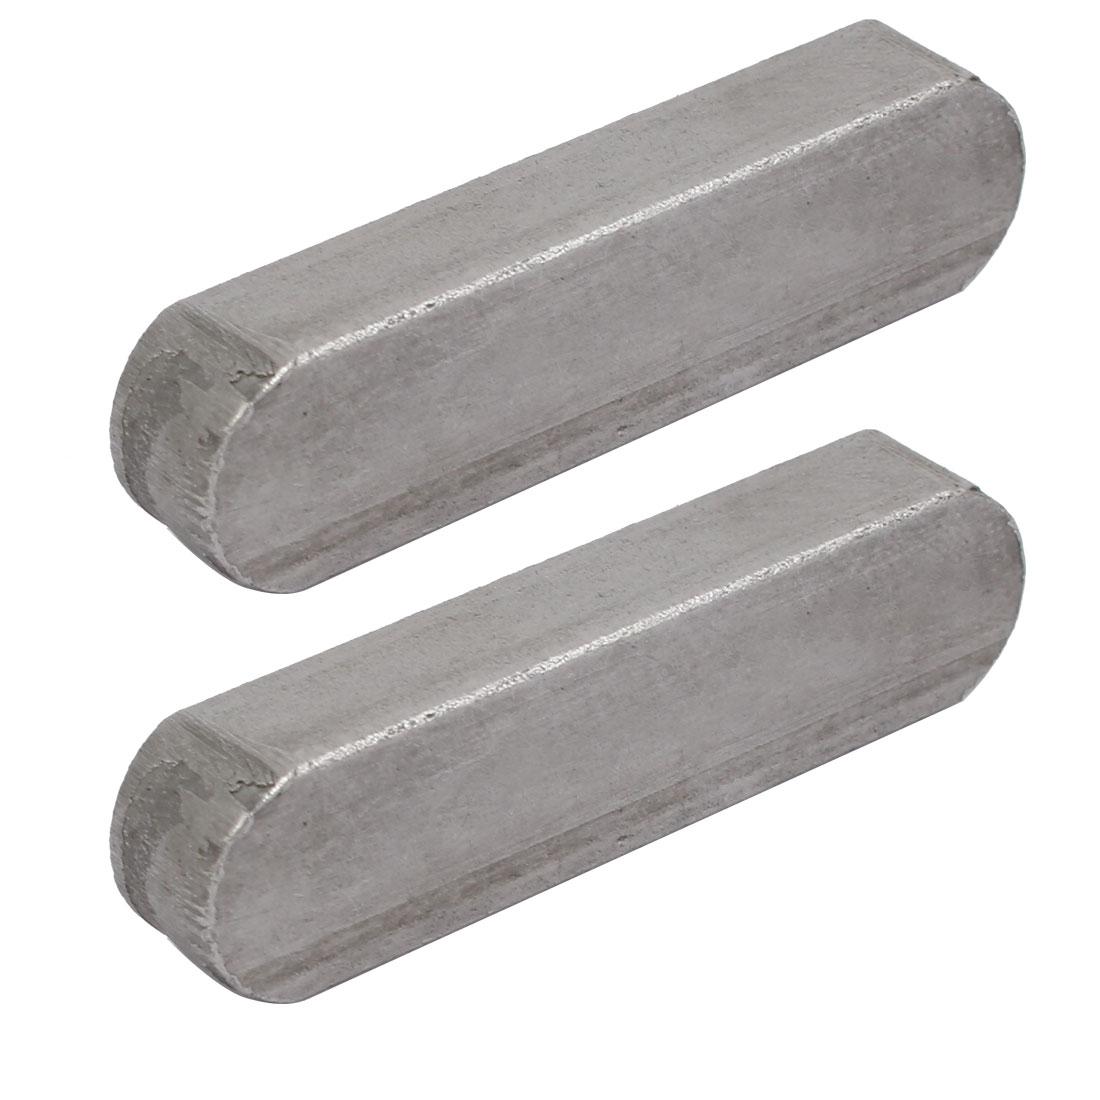 55mmx14mmx9mm Carbon Steel Key Stock To Lock Pulleys 2pcs